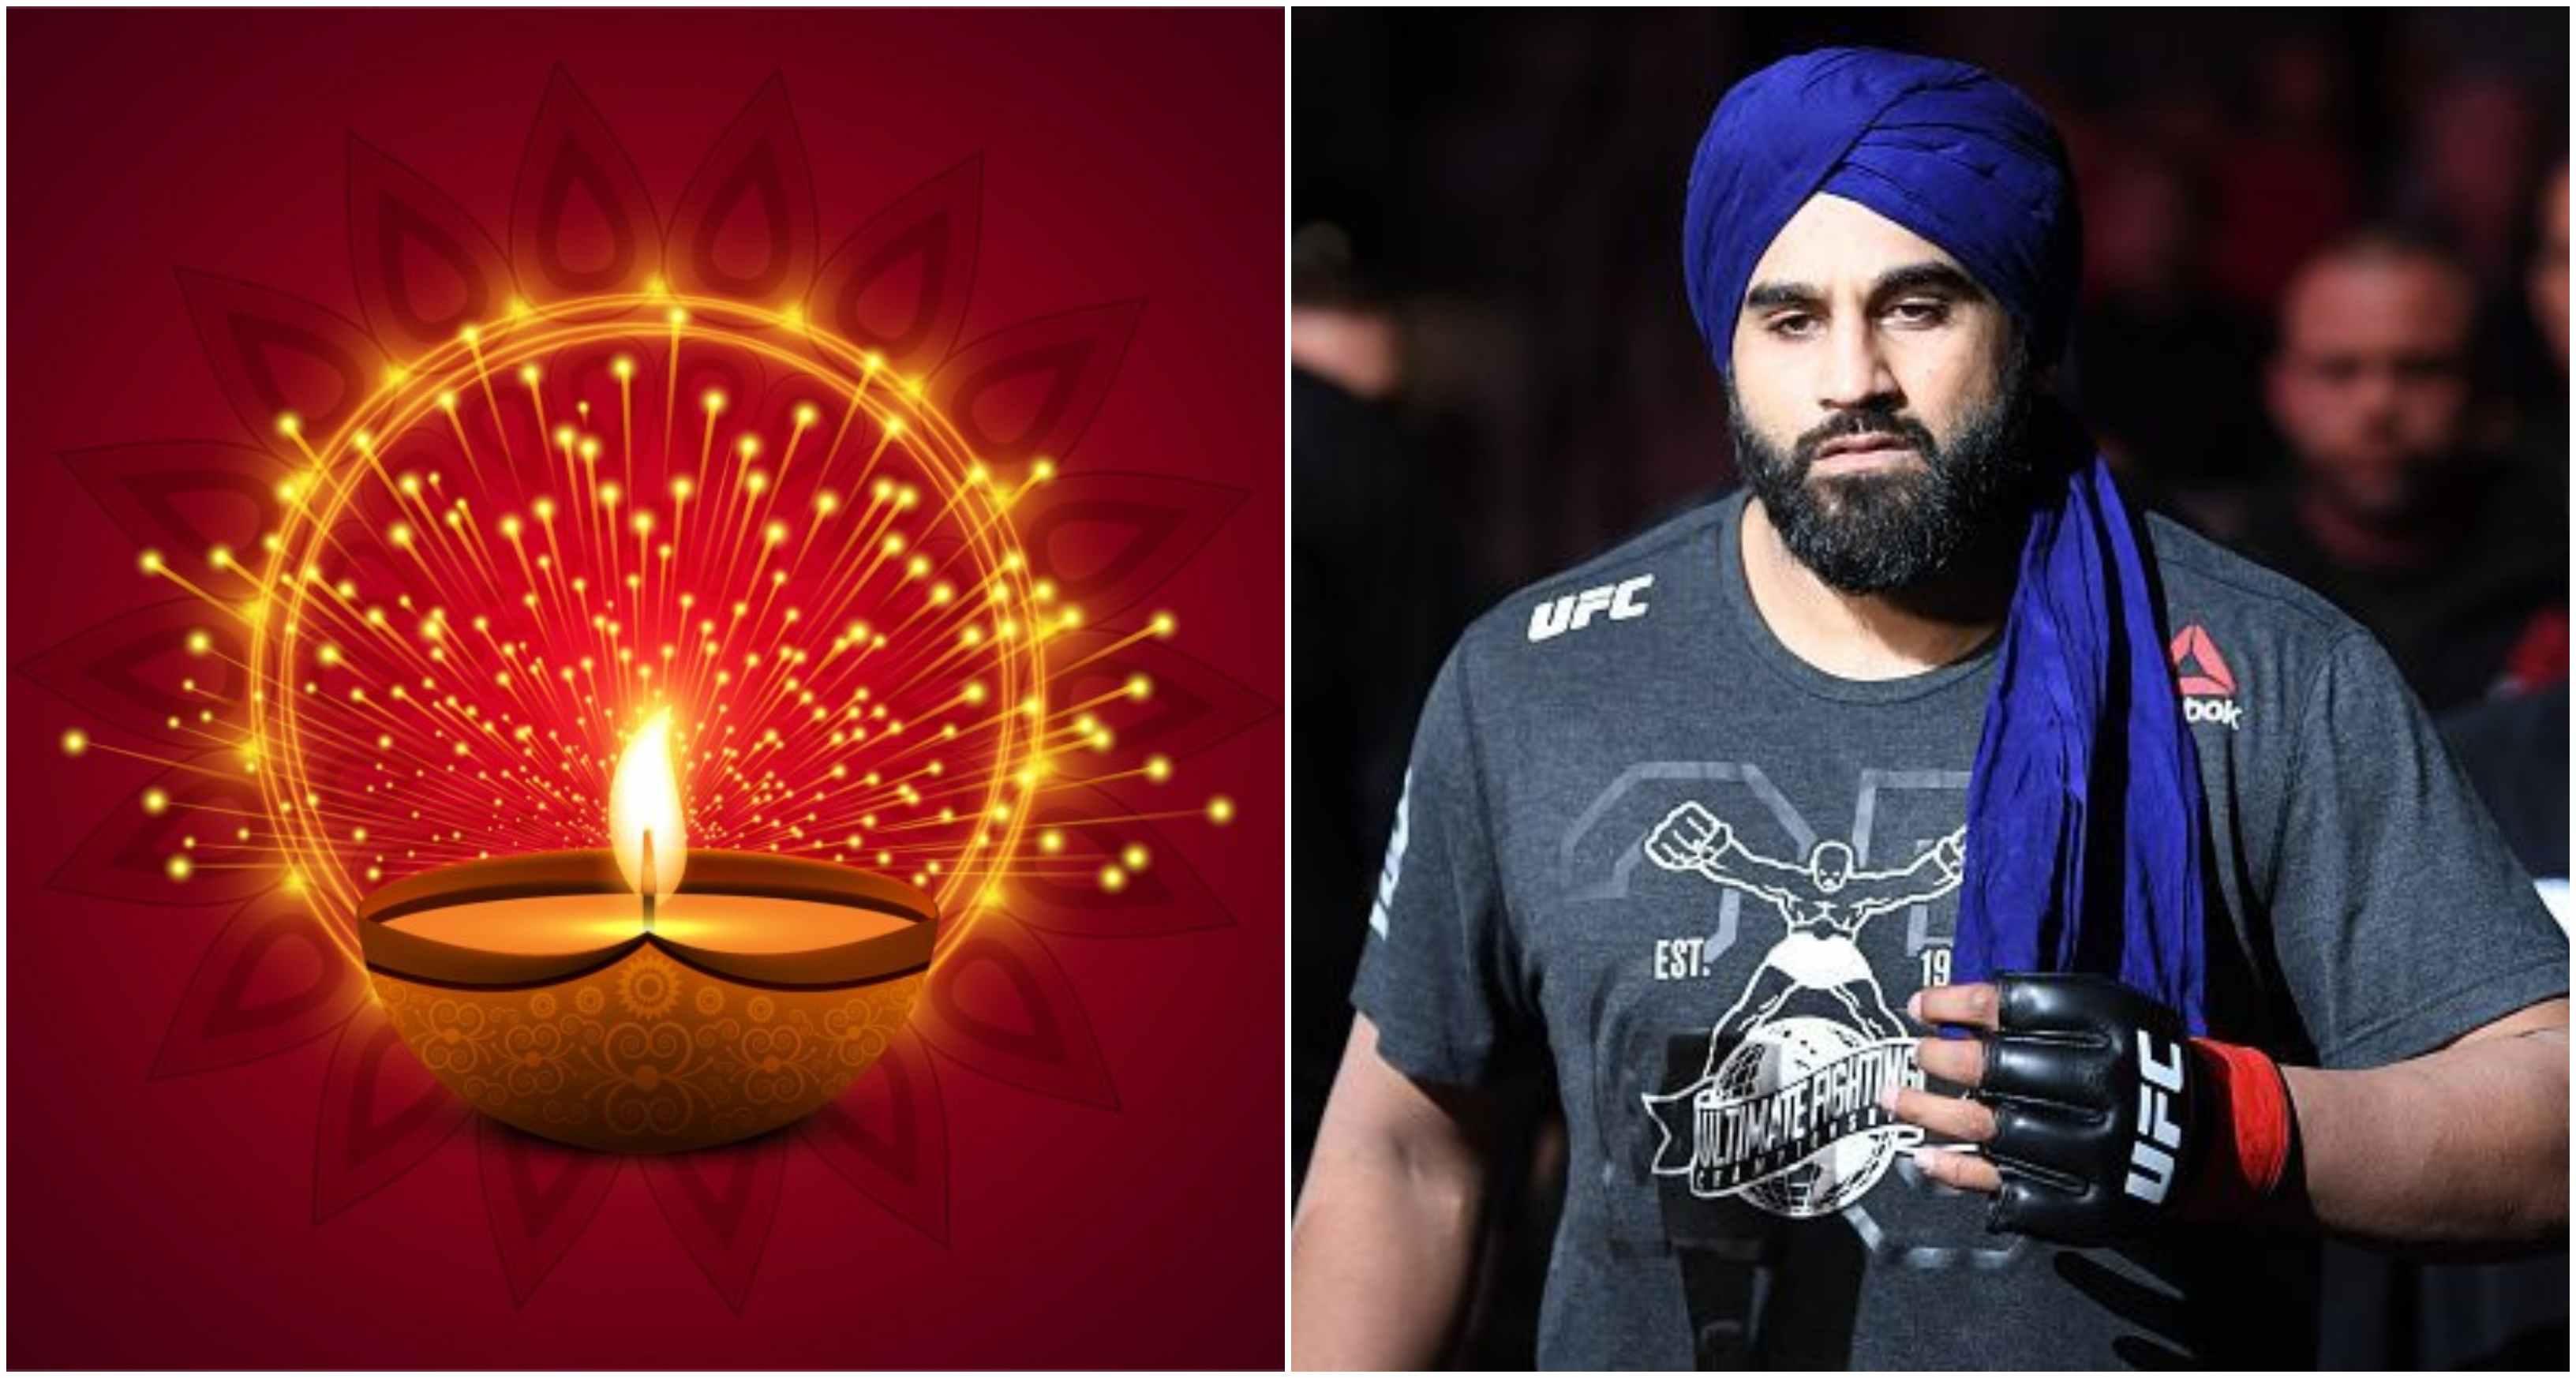 Arjan Singh Bhullar sends Diwali wishes to all celebrating the festival of light - Bhullar